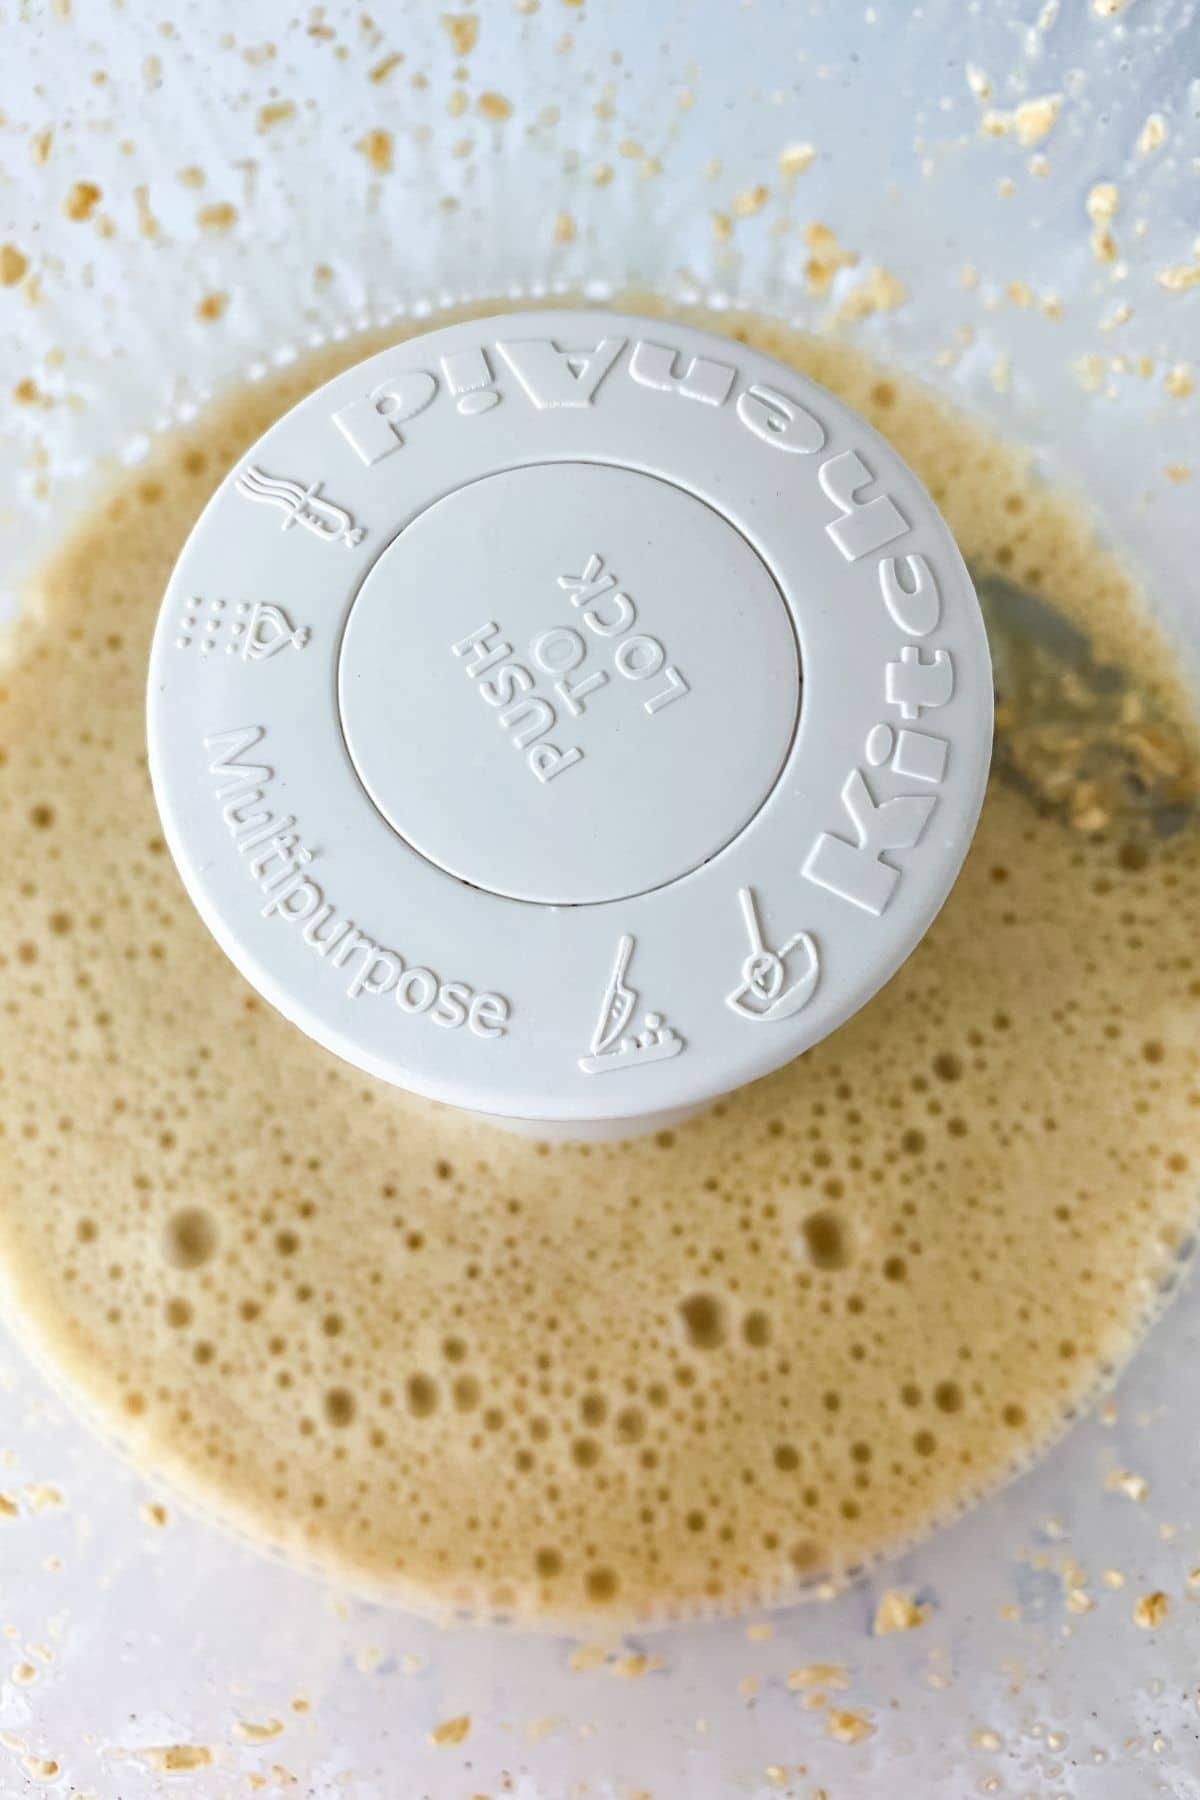 Liquid ingredients in food processor